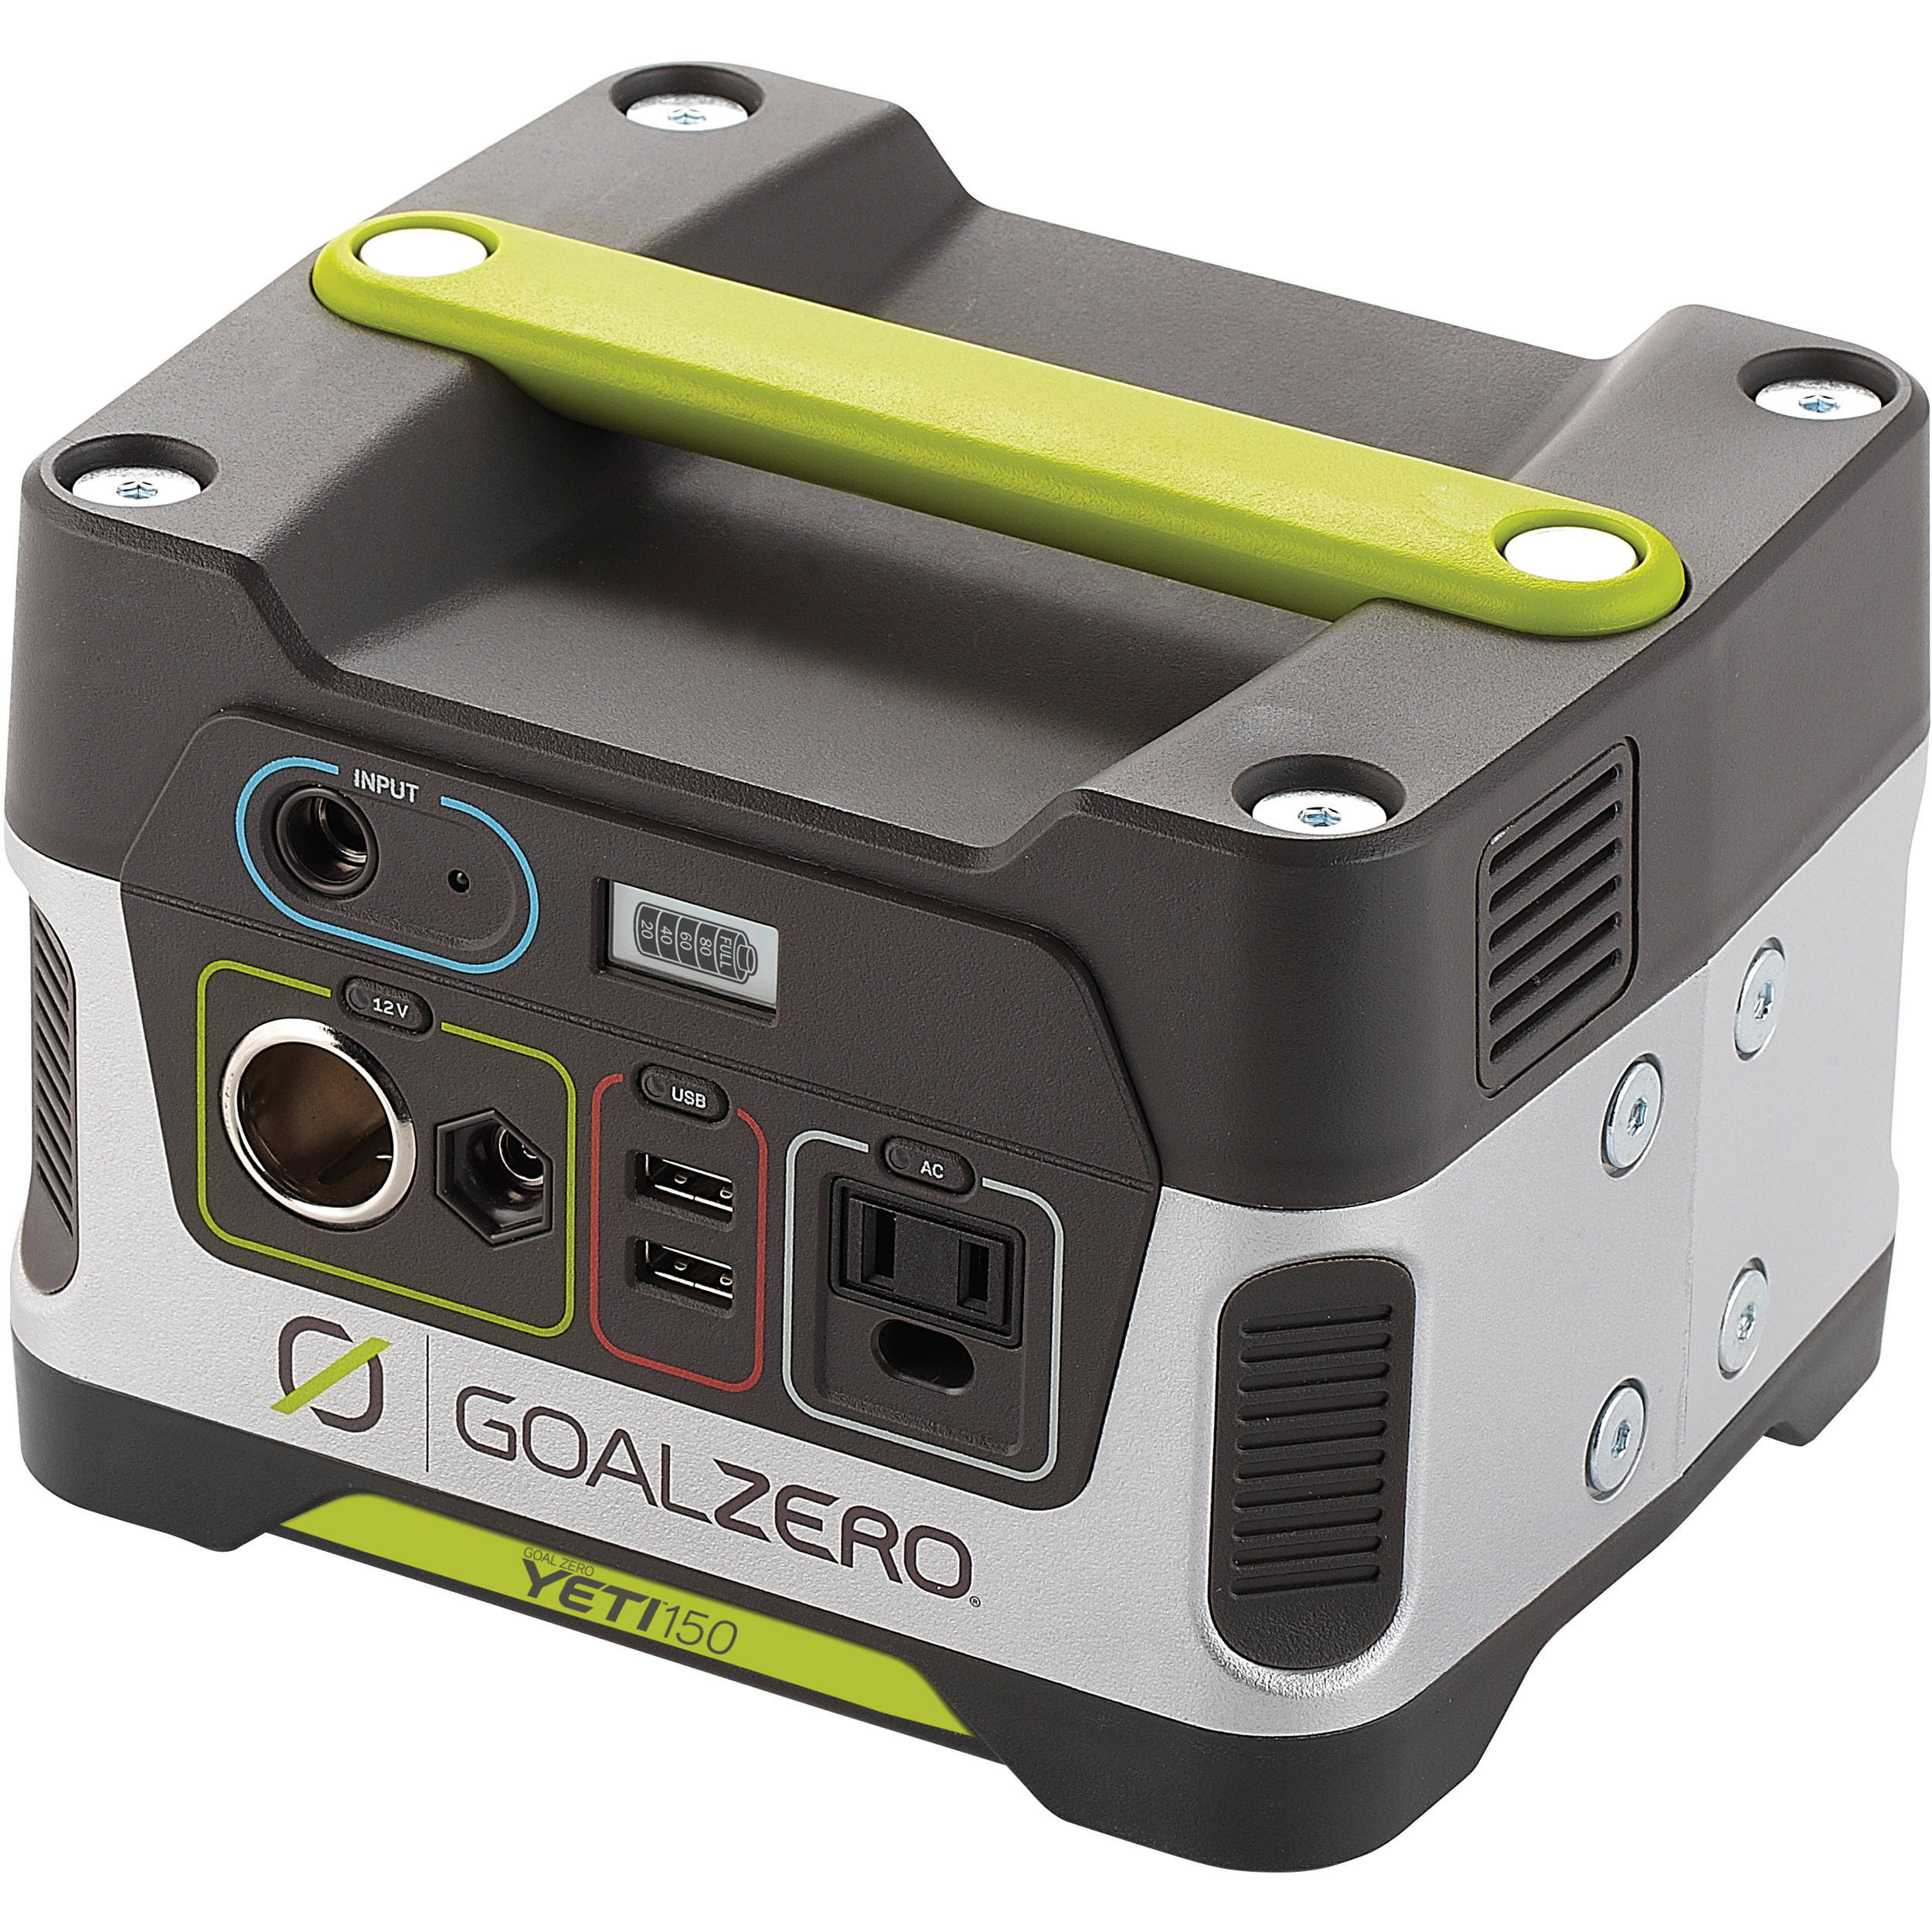 Solar Portable Power Bh Photo Video Deer Feeder Battery Charger On Wiring Panel Goal Zero Yeti 150 Generator Pack